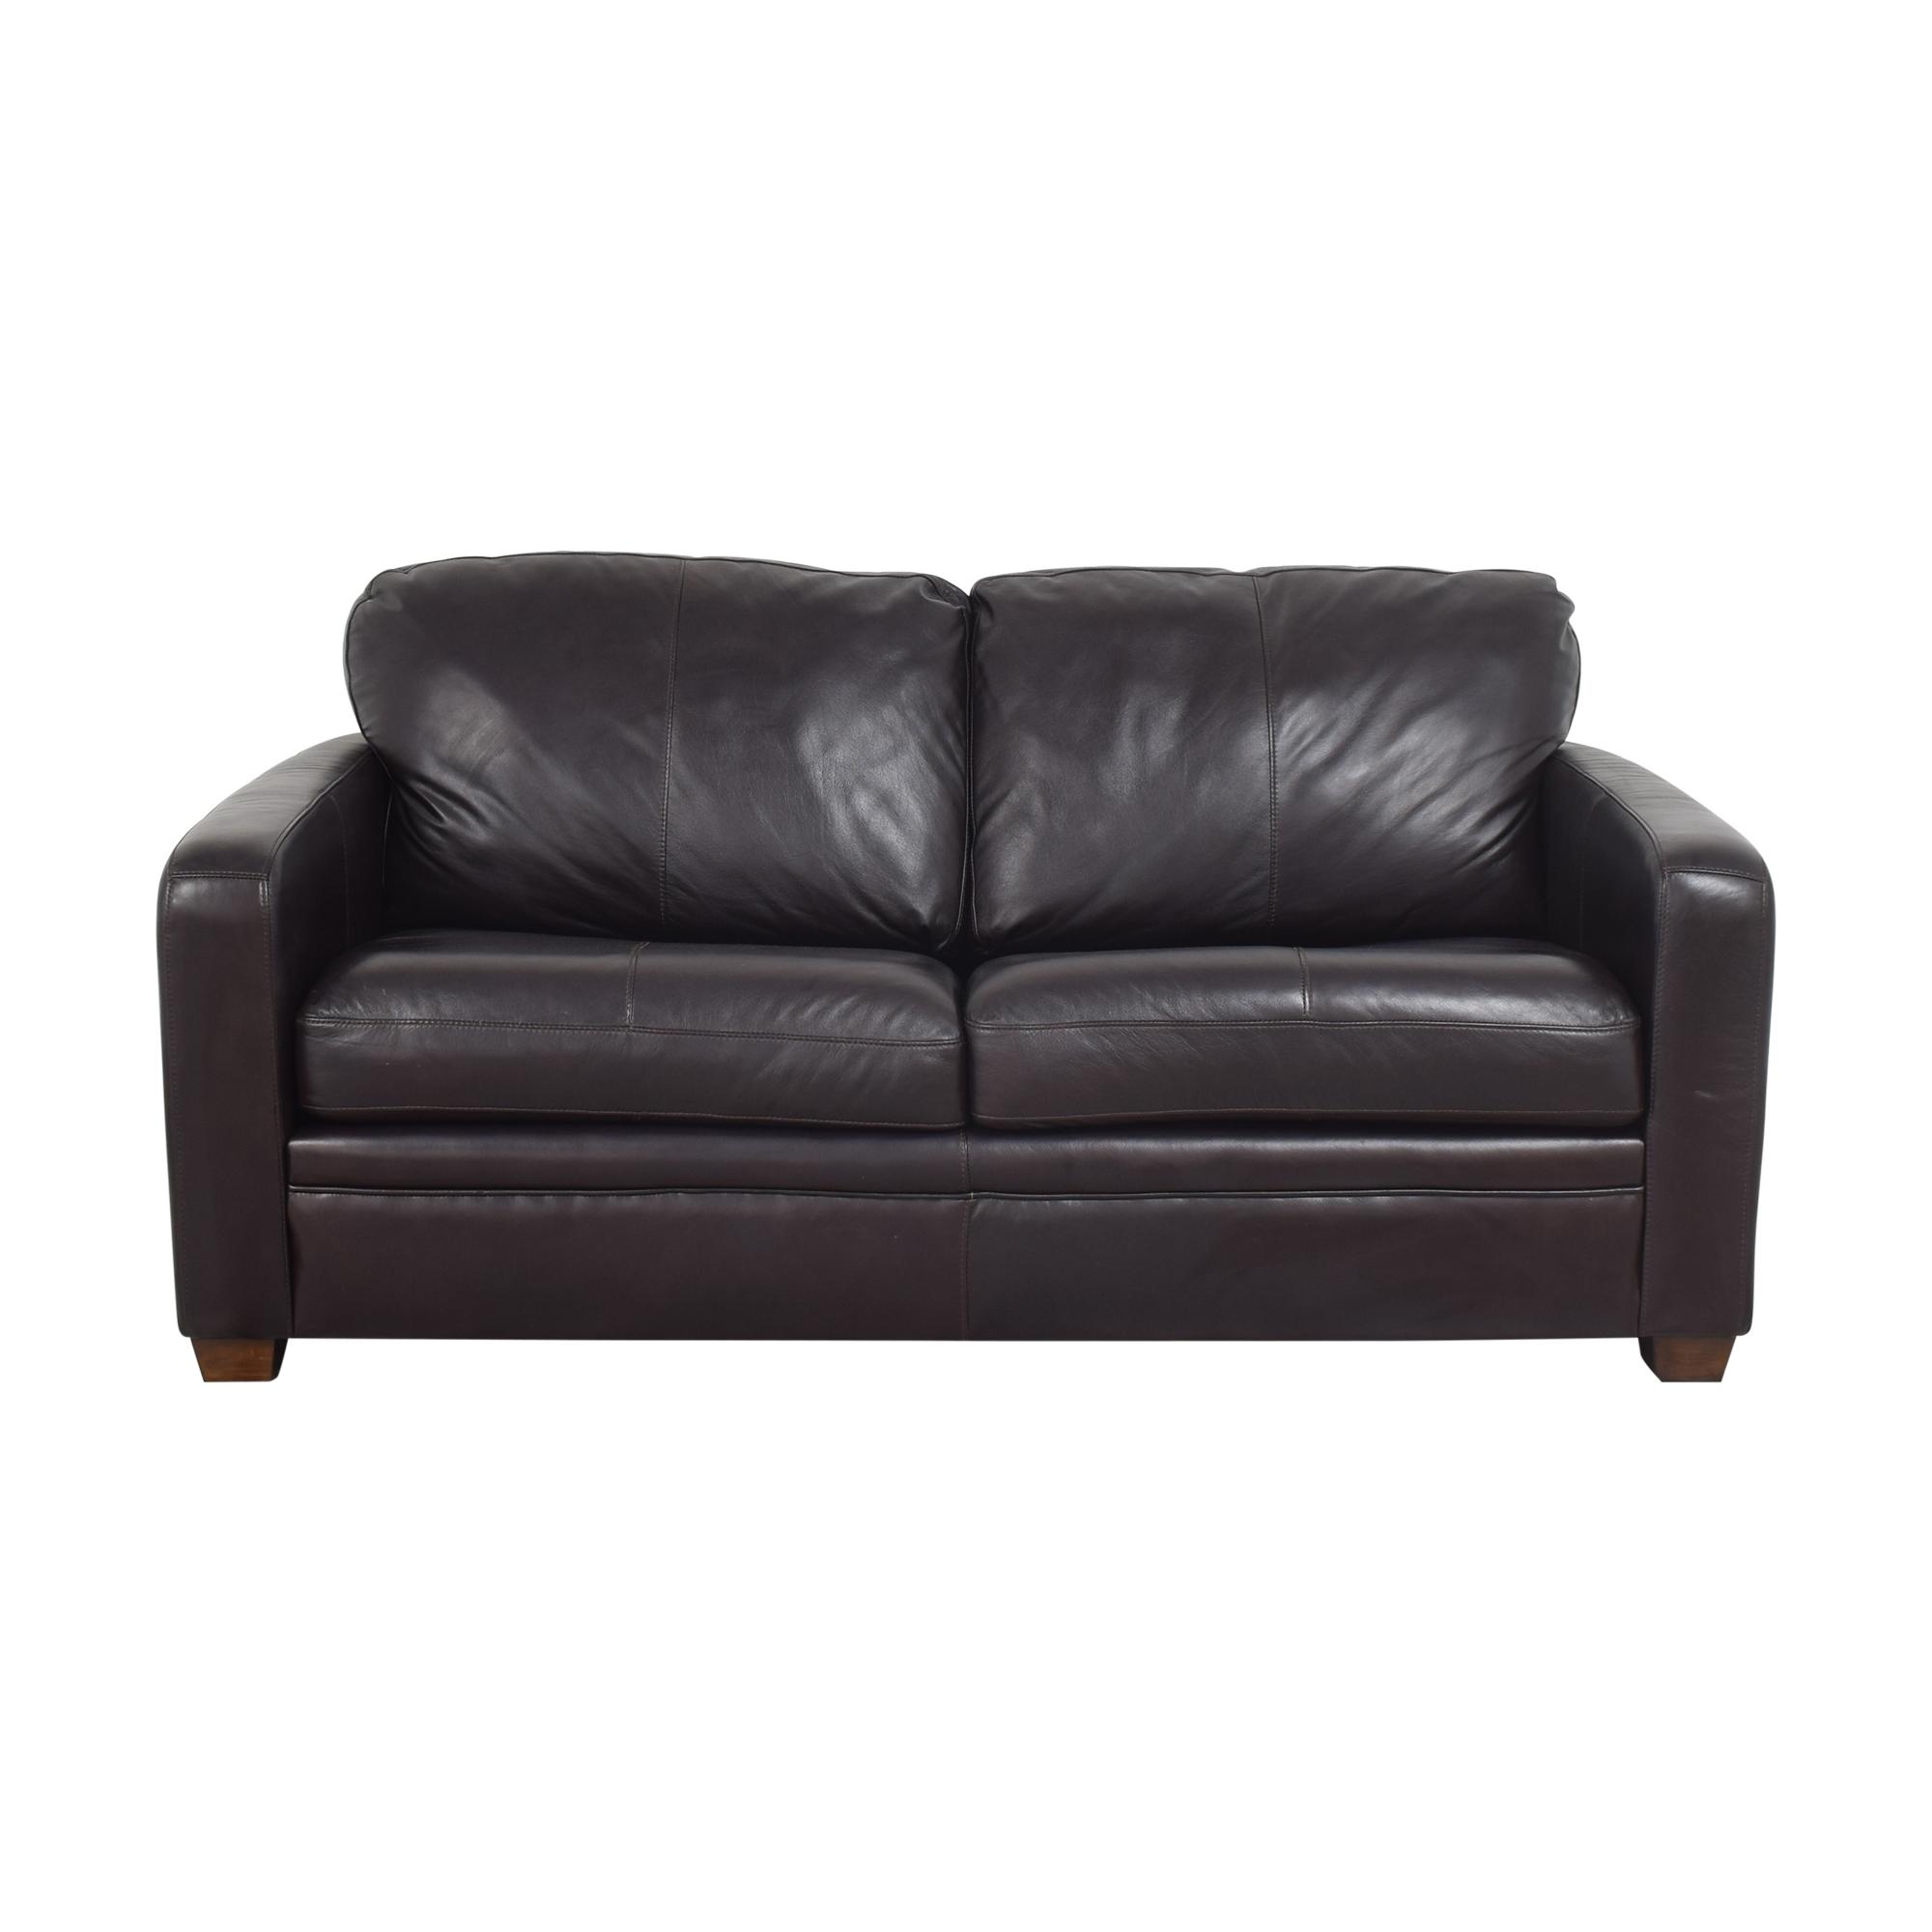 Raymour & Flanigan Raymour & Flanigan Trent Sleeper Sofa dimensions